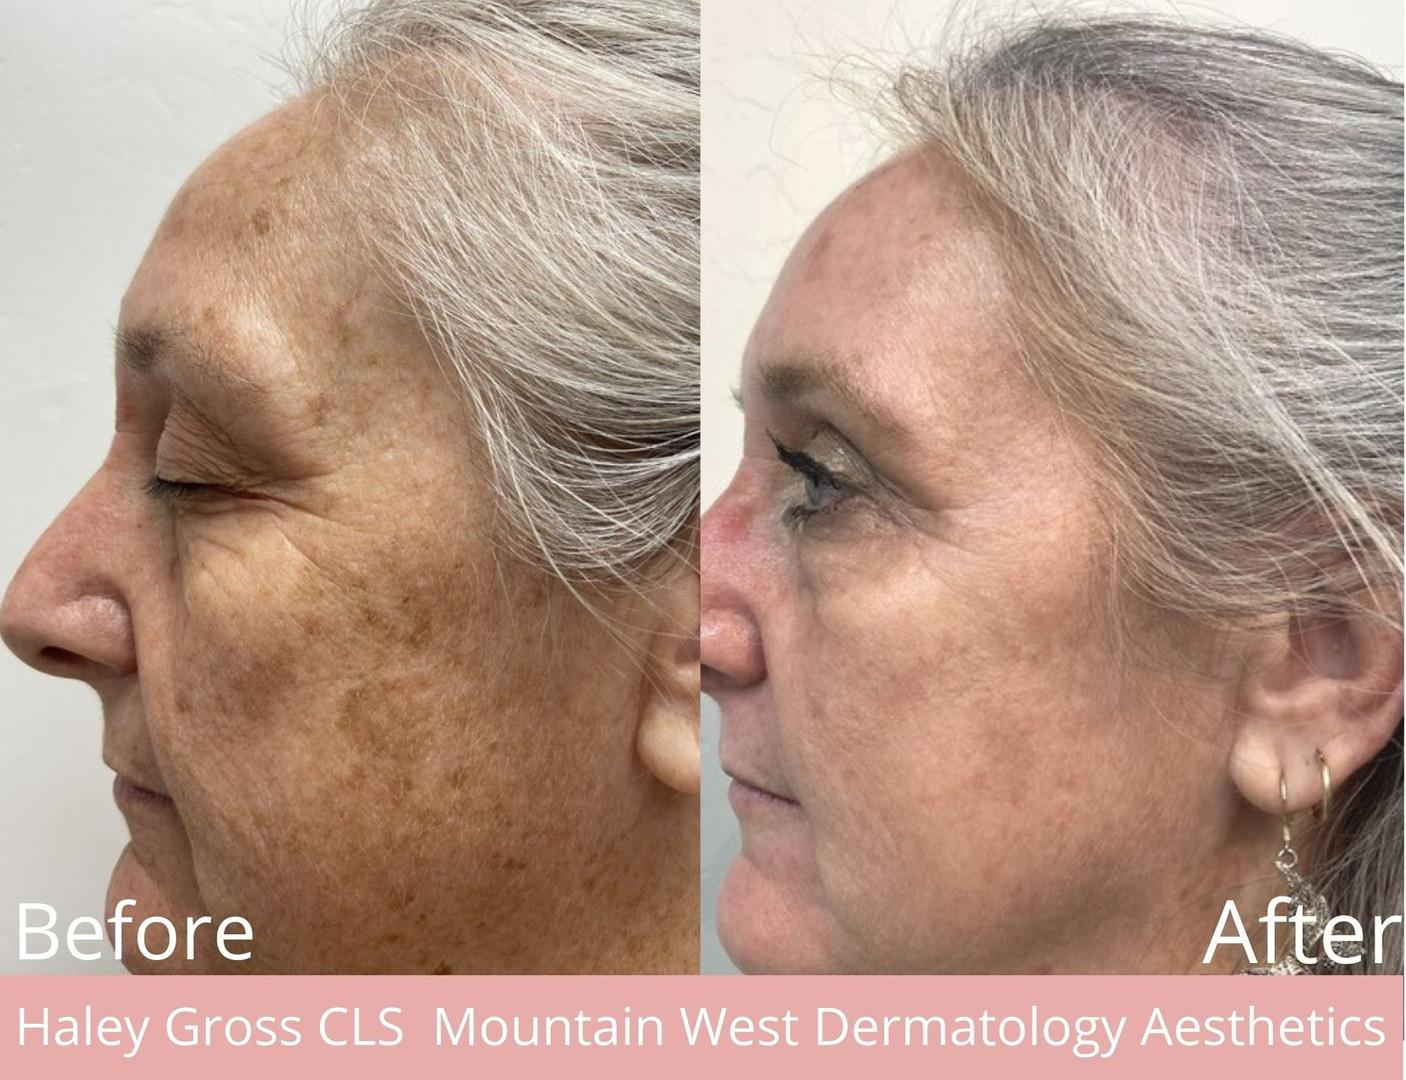 Skin Rejuvenation with AFT by Haley Gross CLS